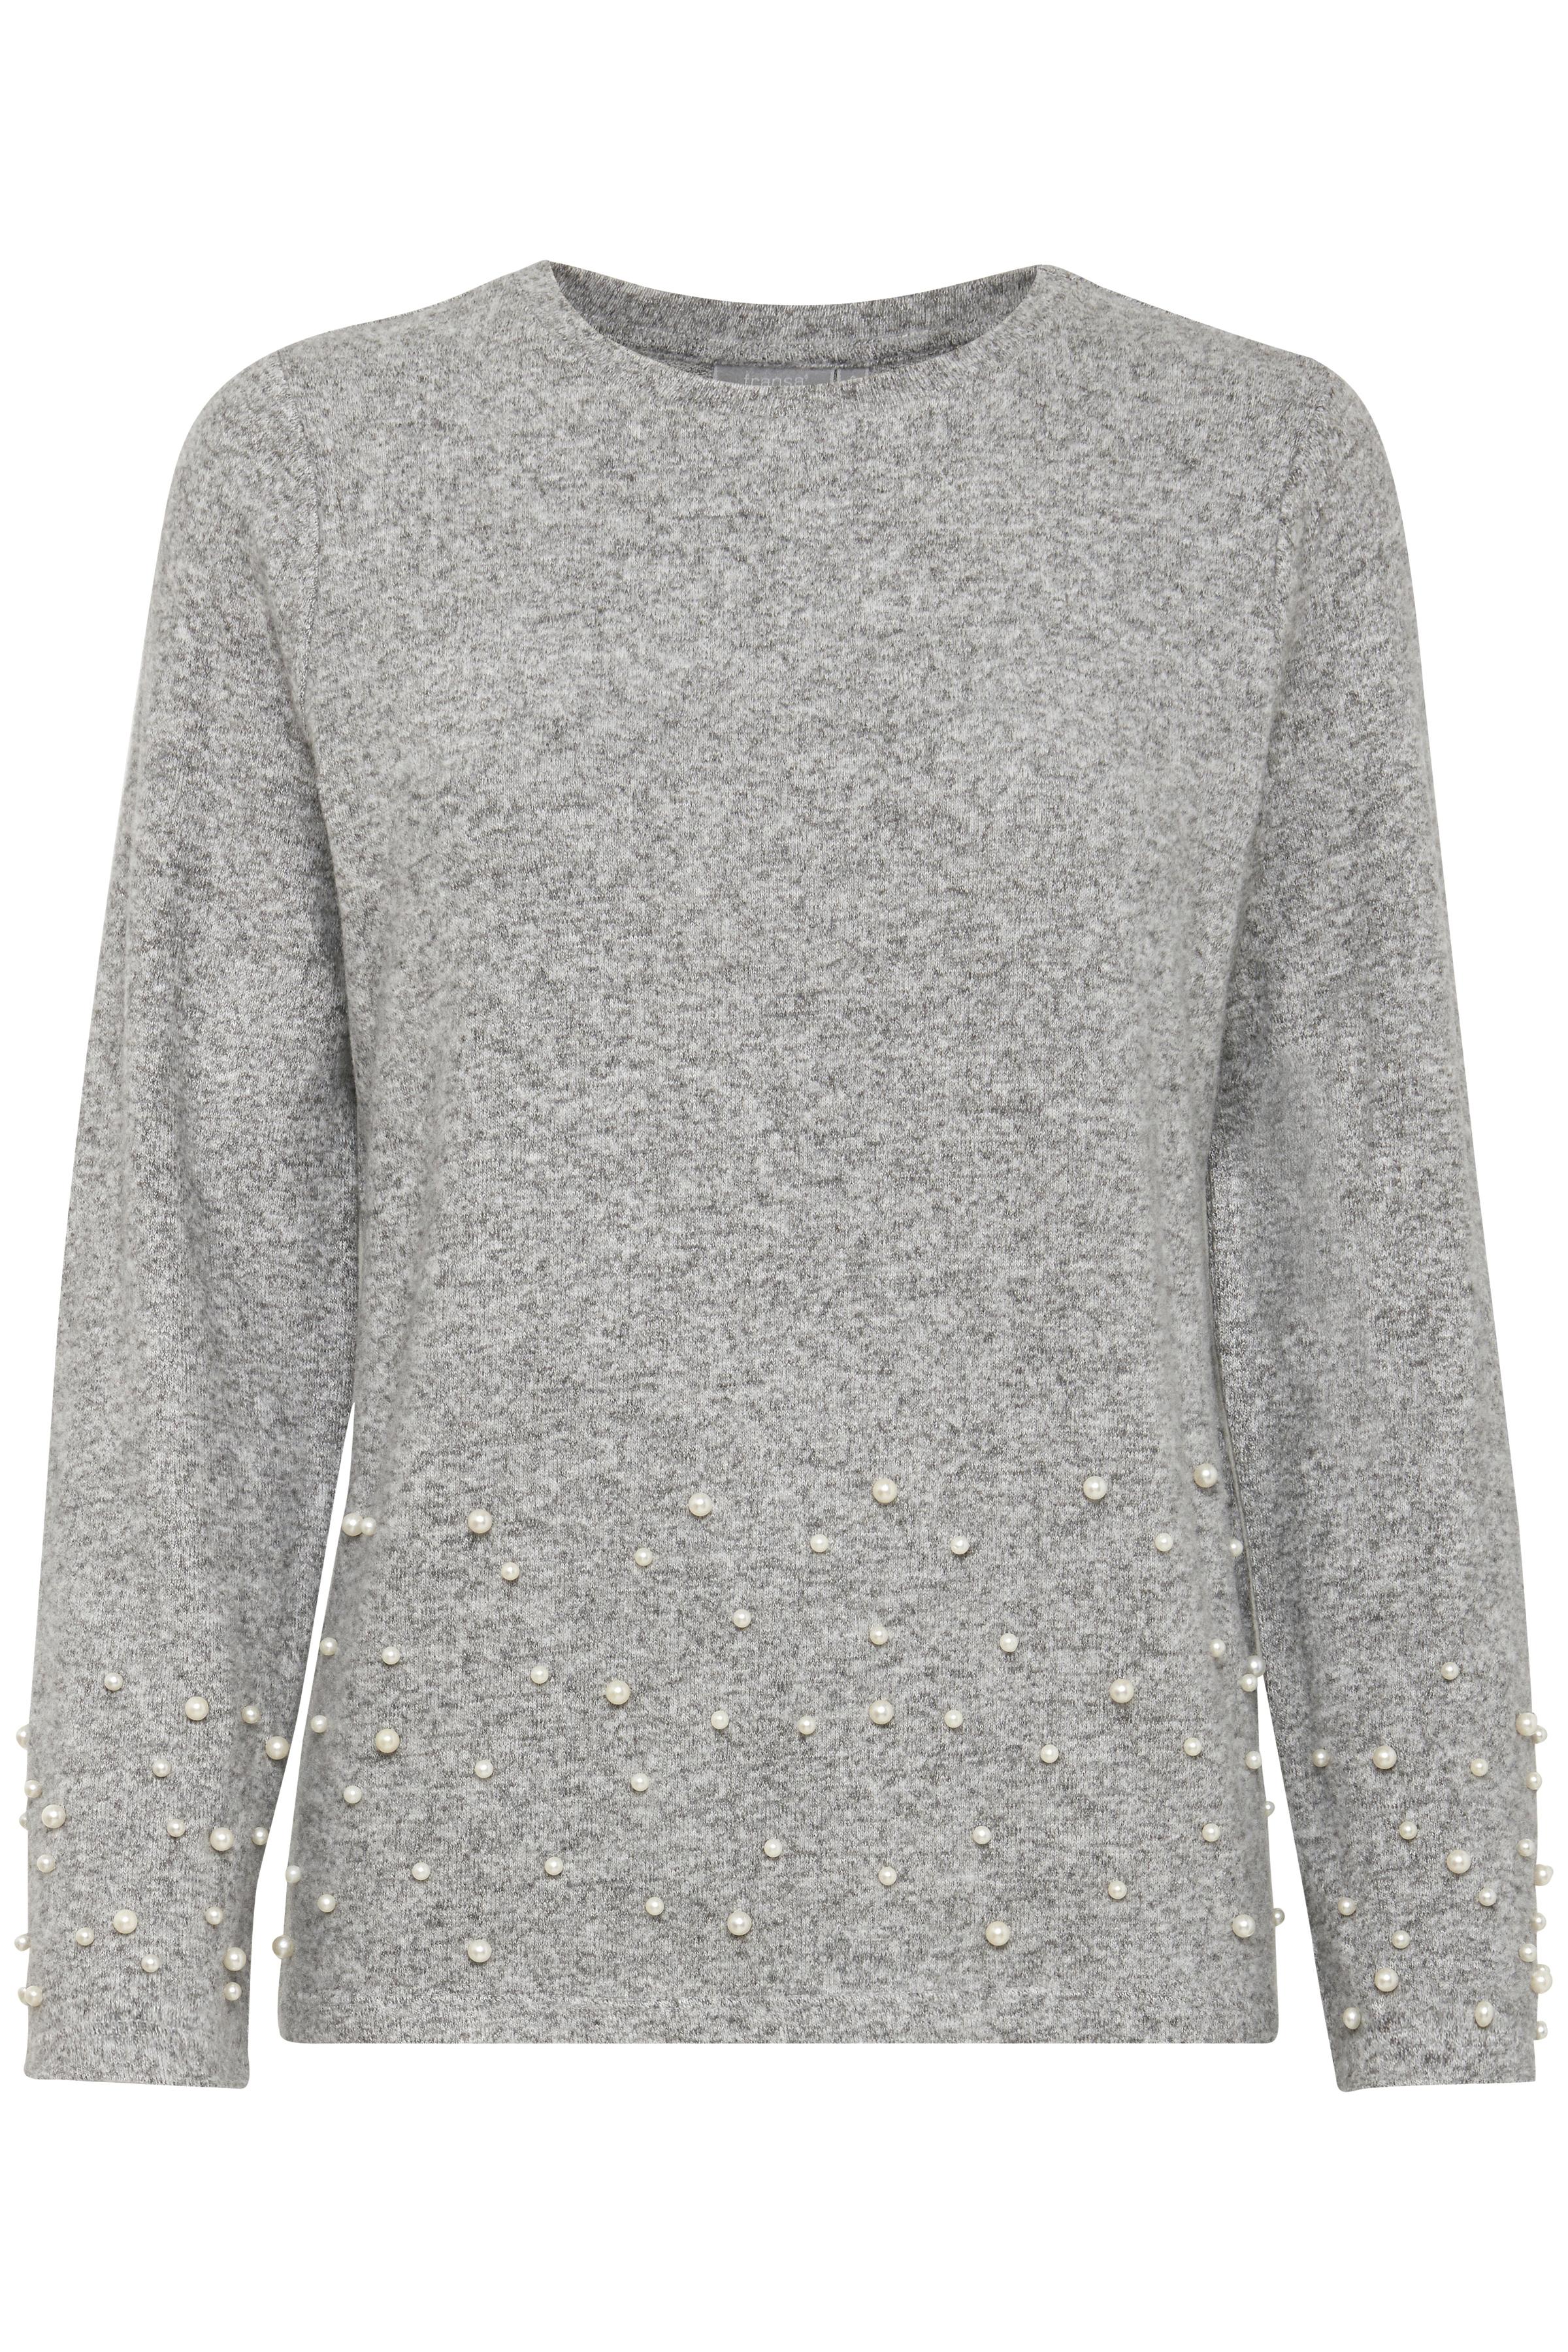 Lys gråmeleret Langærmet T-shirt fra Fransa – Køb Lys gråmeleret Langærmet T-shirt fra str. XS-XXL her